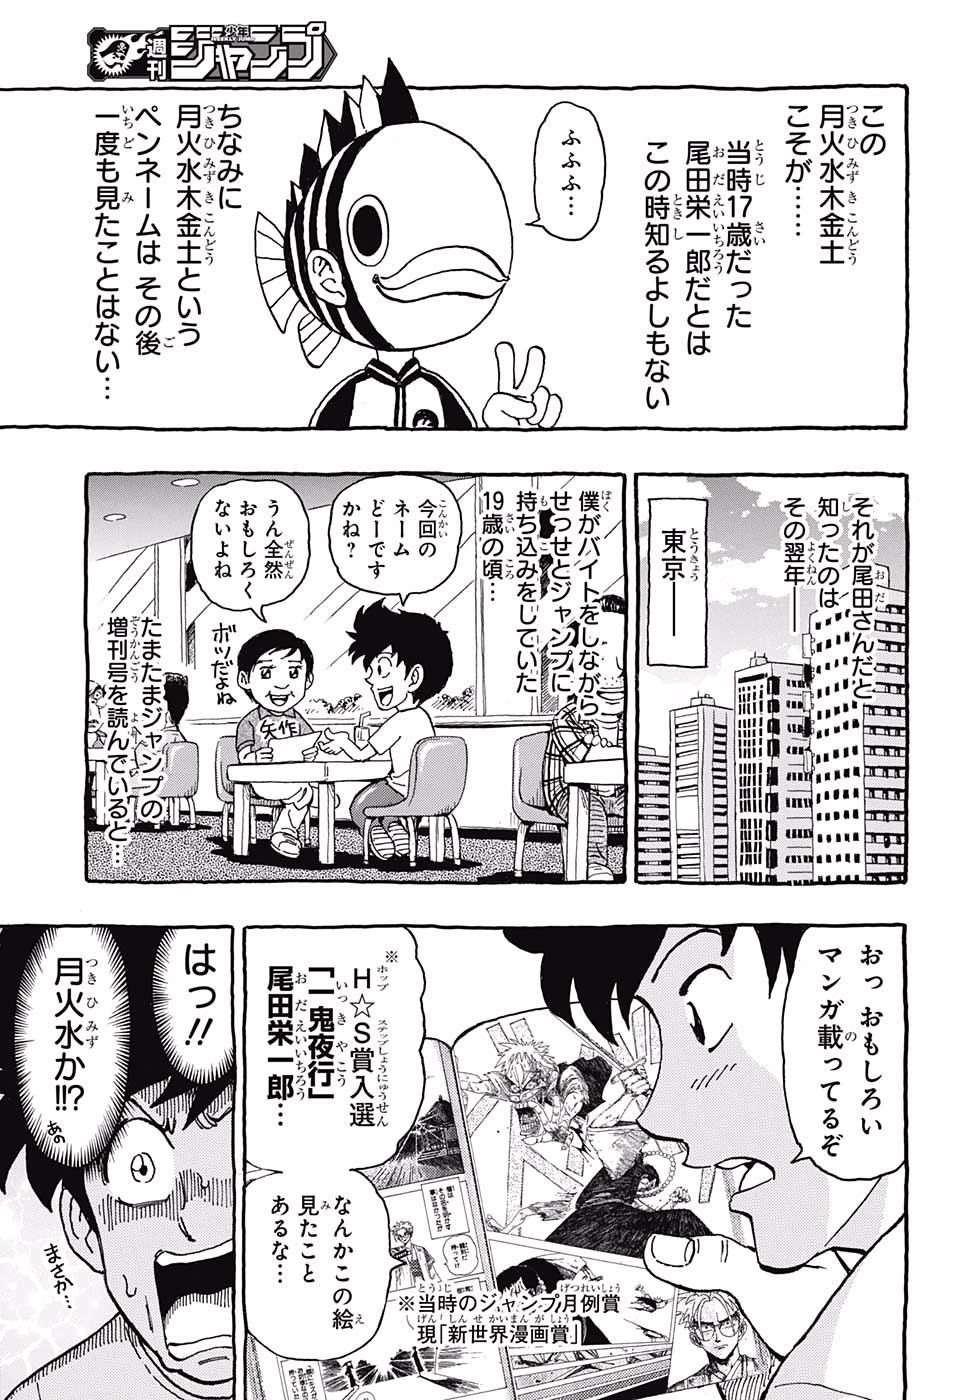 One Piece Manga 2017 Jpnt2tBd